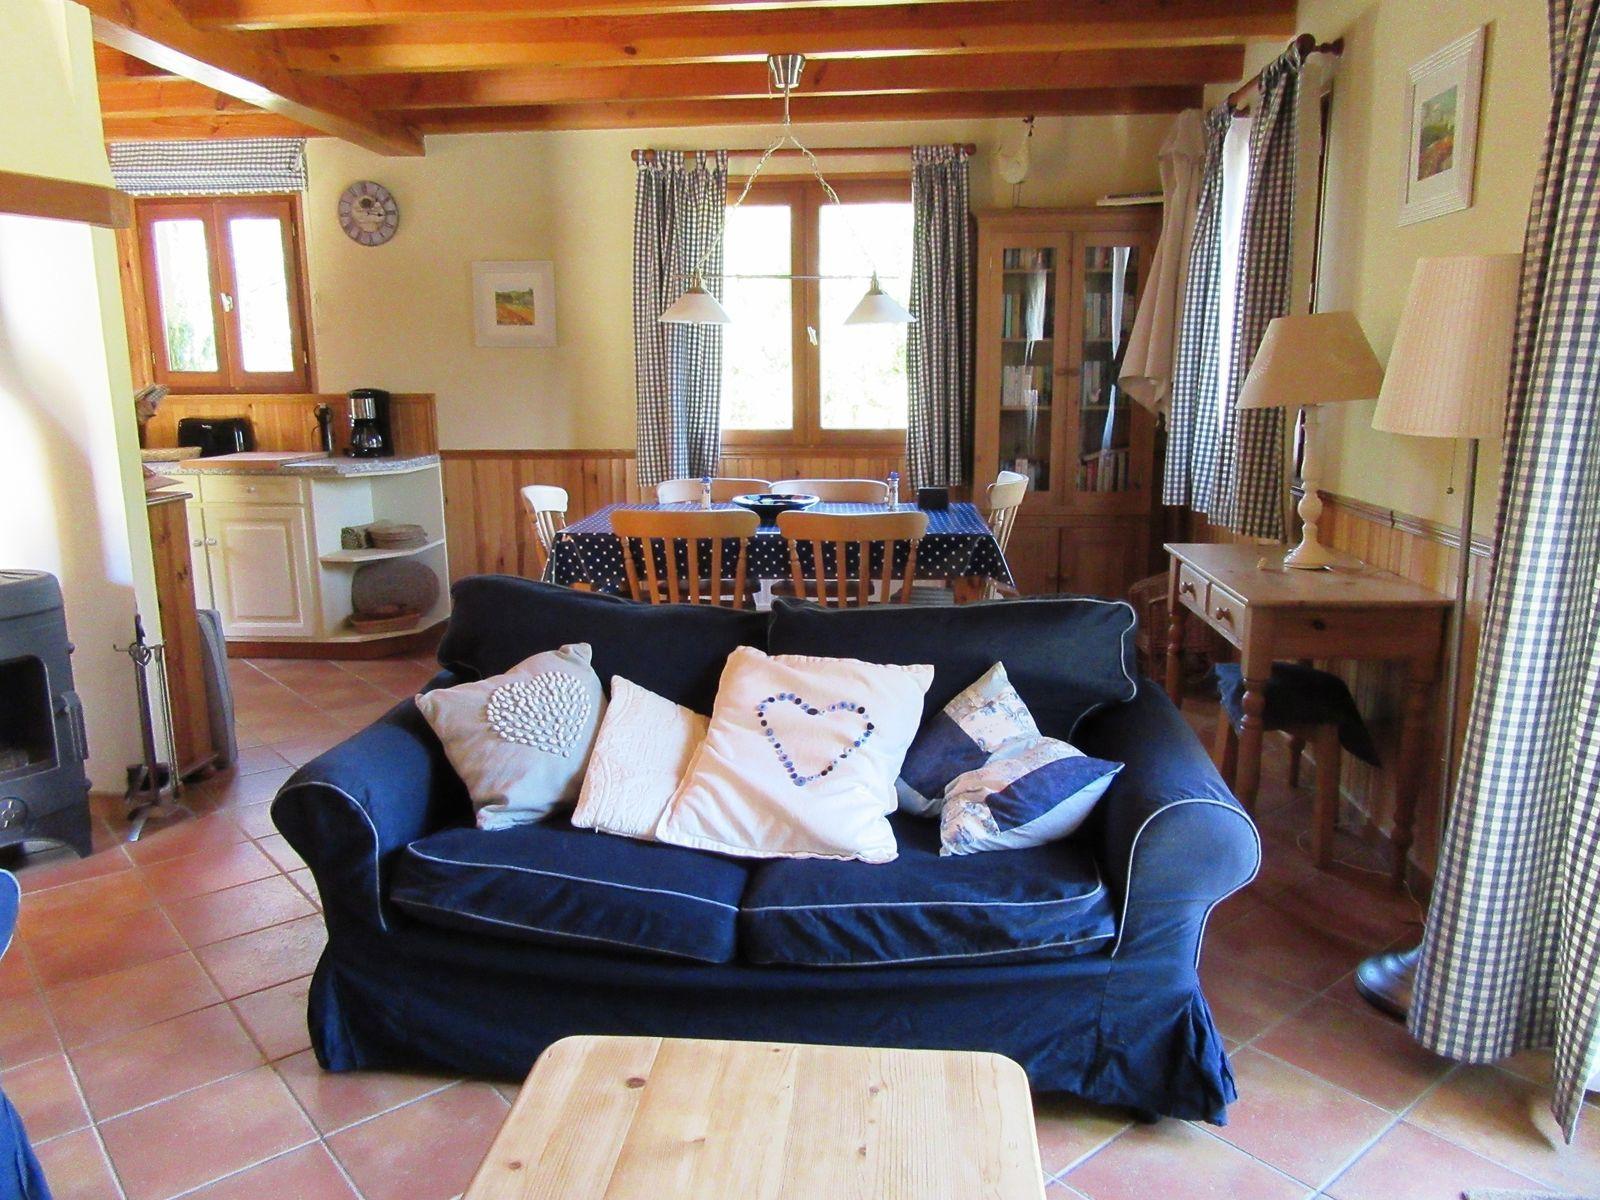 Souillac Country Club - chalet Perigord Confort - vakantiehuizen Frankrijk